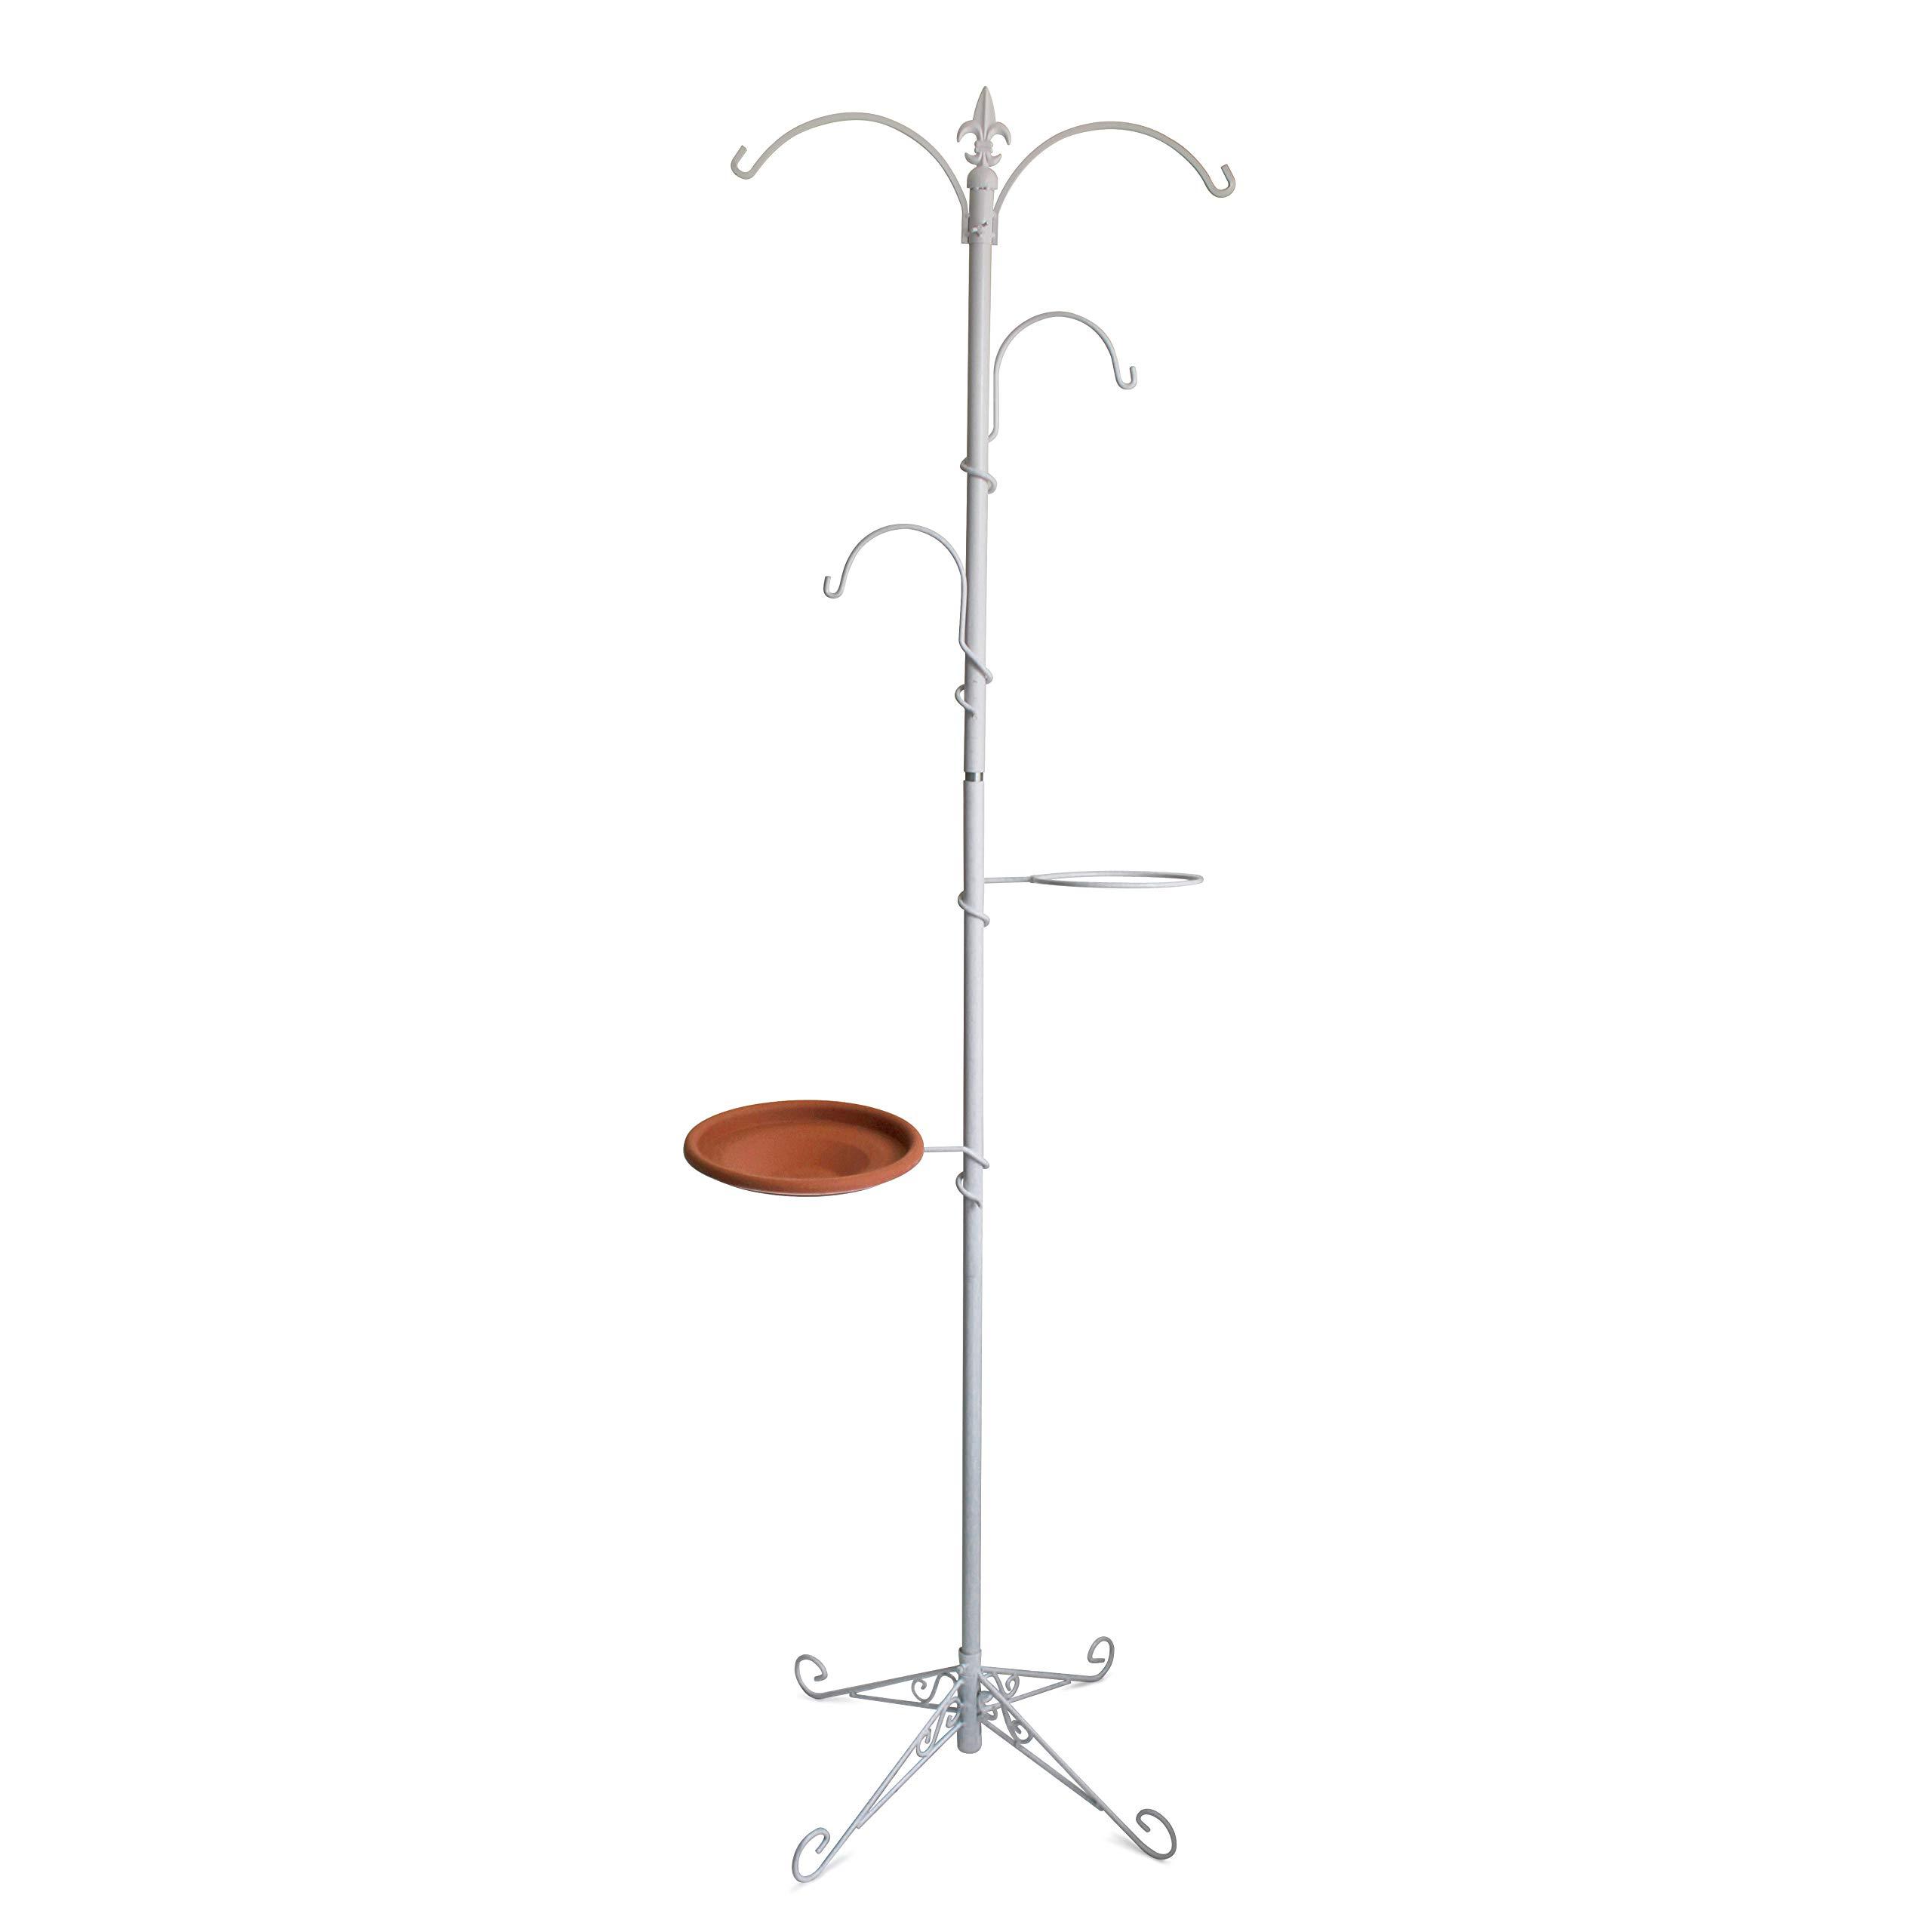 "Gray Bunny GB-6888W Premium Yard Tree Metal Stand- Bird Feeding Station Kit/Hanging Garden System, 79""(200 cm) Tall, White, Wind Chime/Lantern Hanger/Planter Stand/Bird Bath/Wild Bird Feeder"